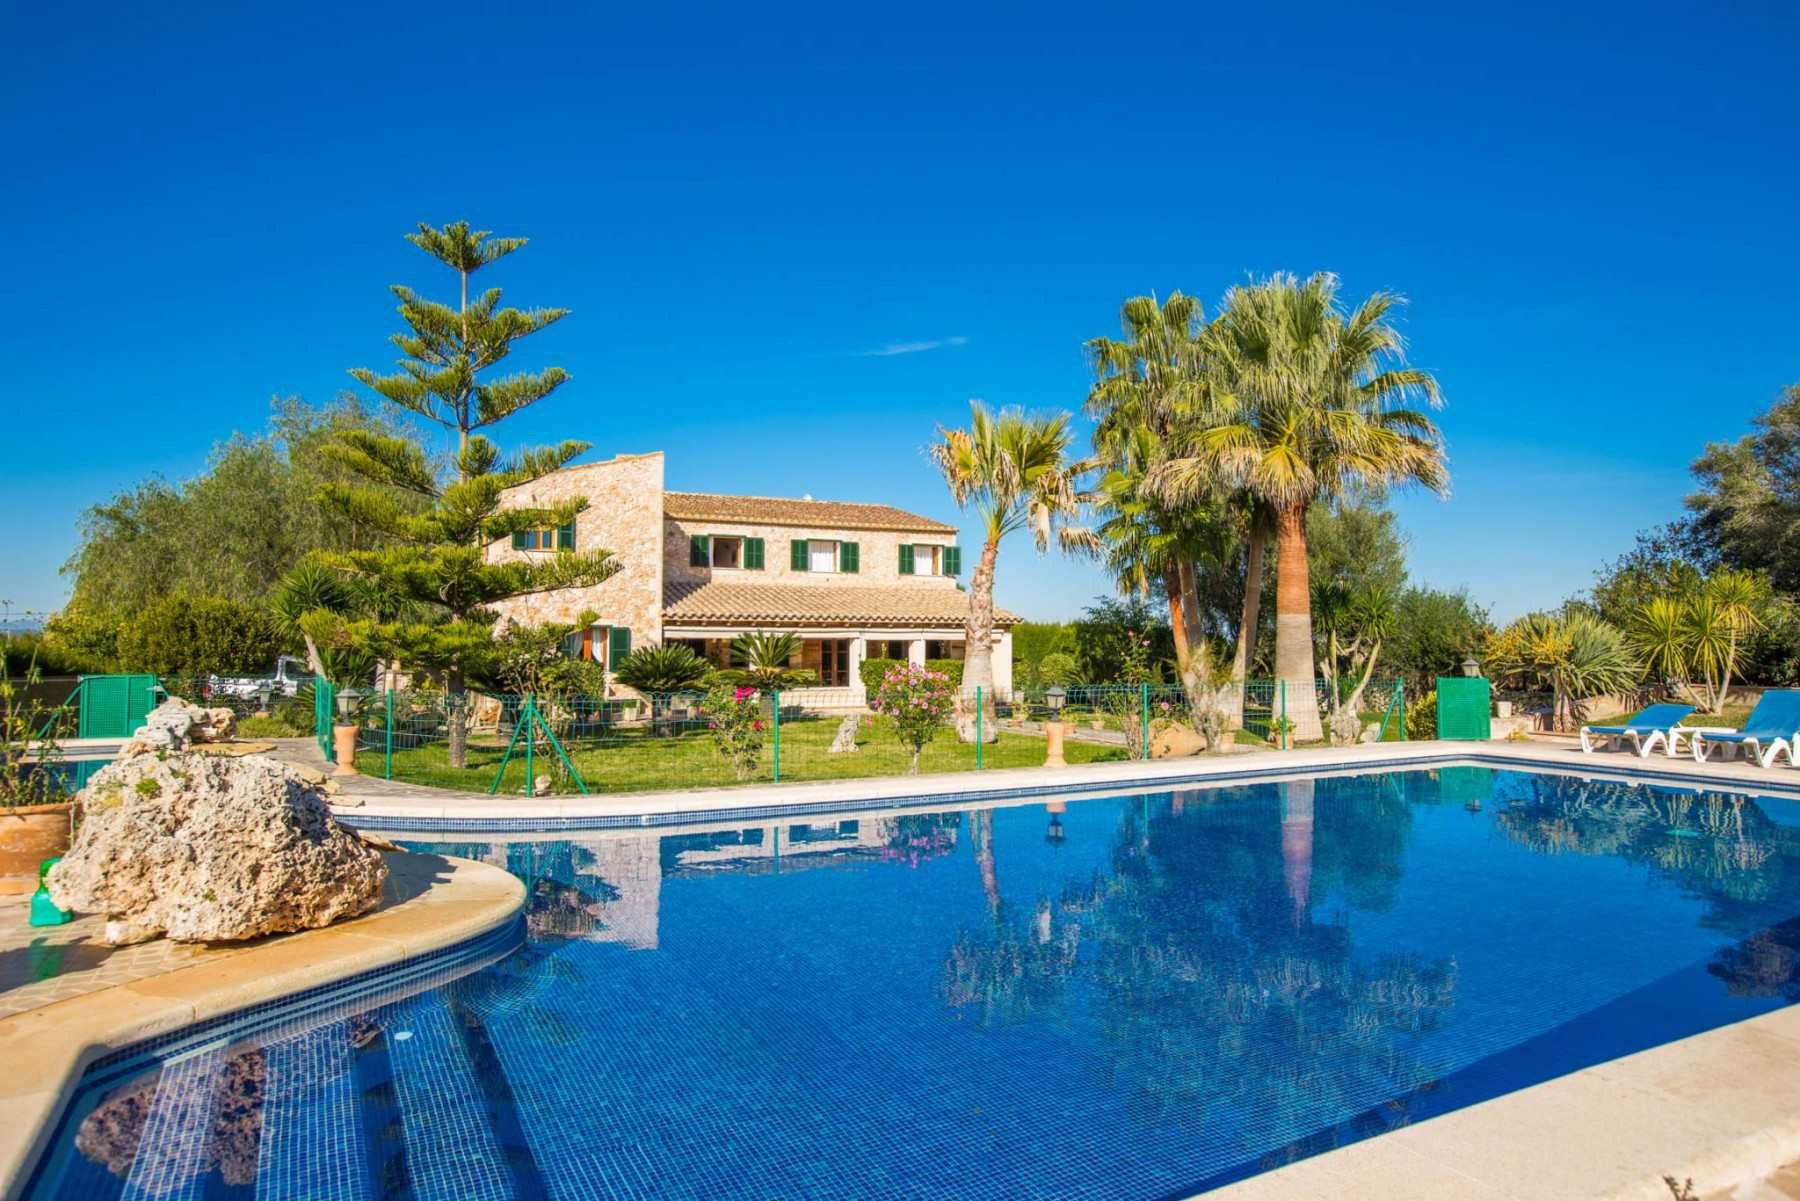 SON MESQUIDA for 12 guests in Felanitx, Spanien